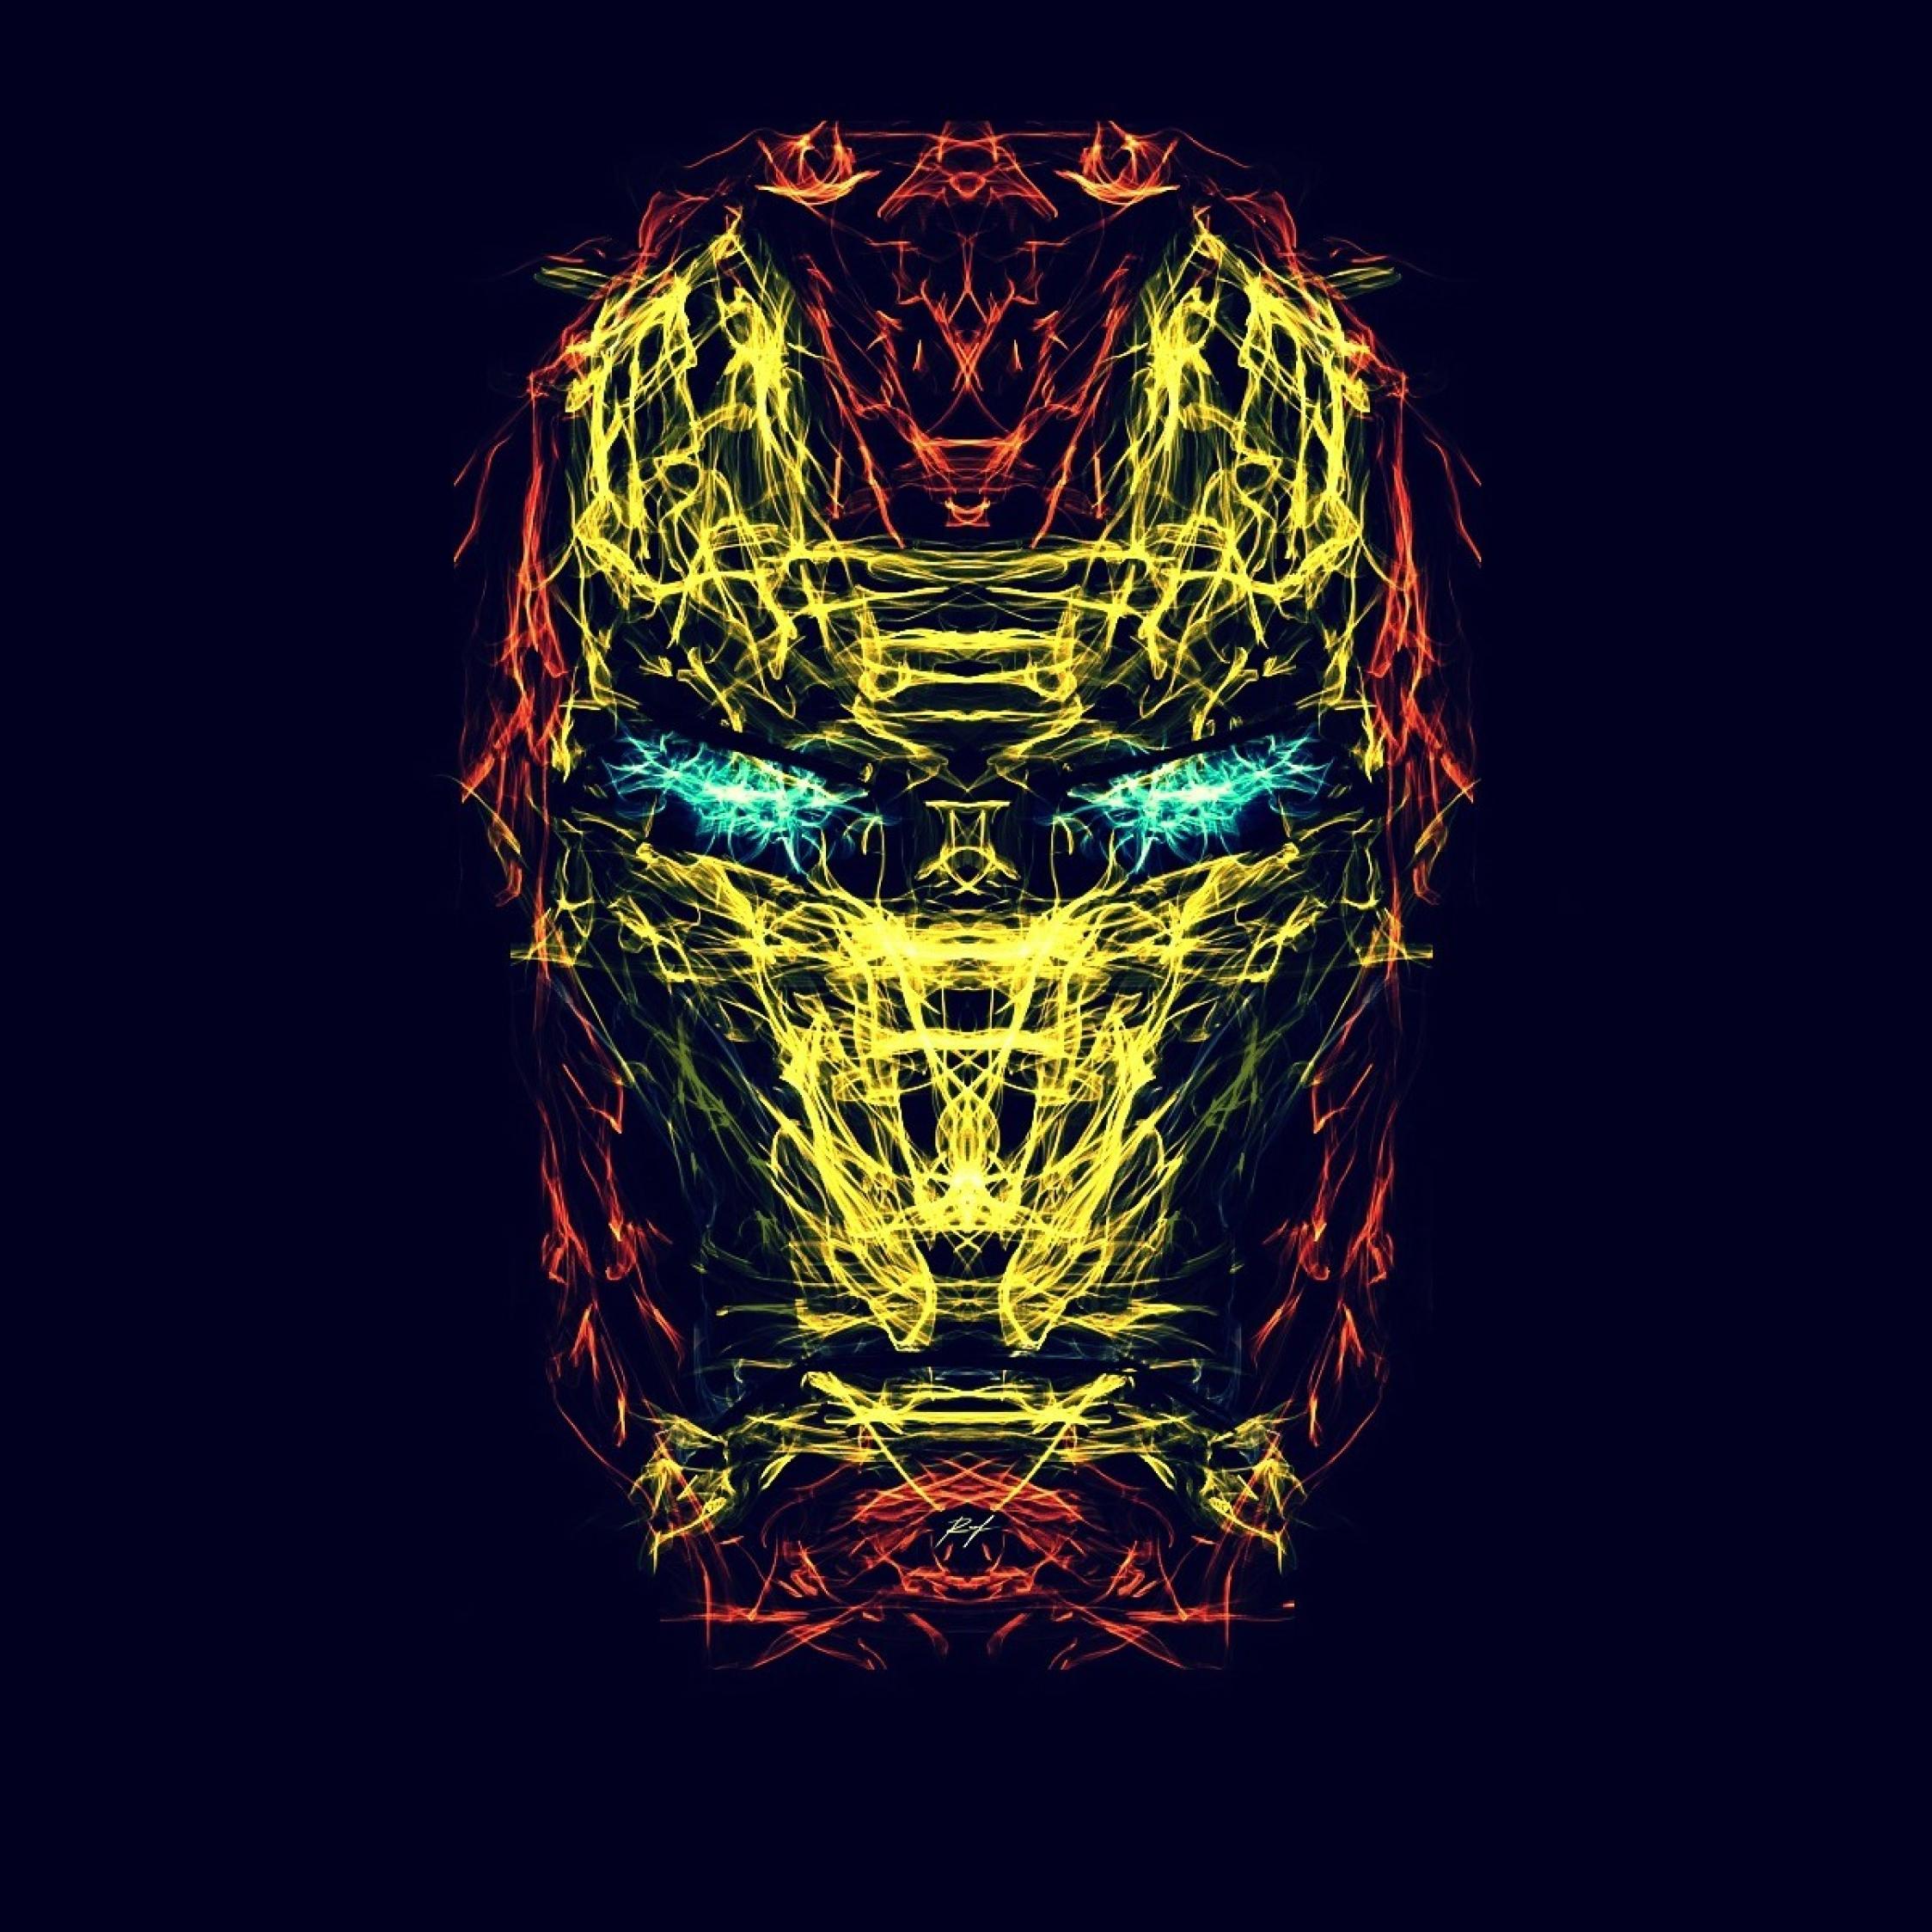 Iron Man Creative Abstract Art, Full HD Wallpaper